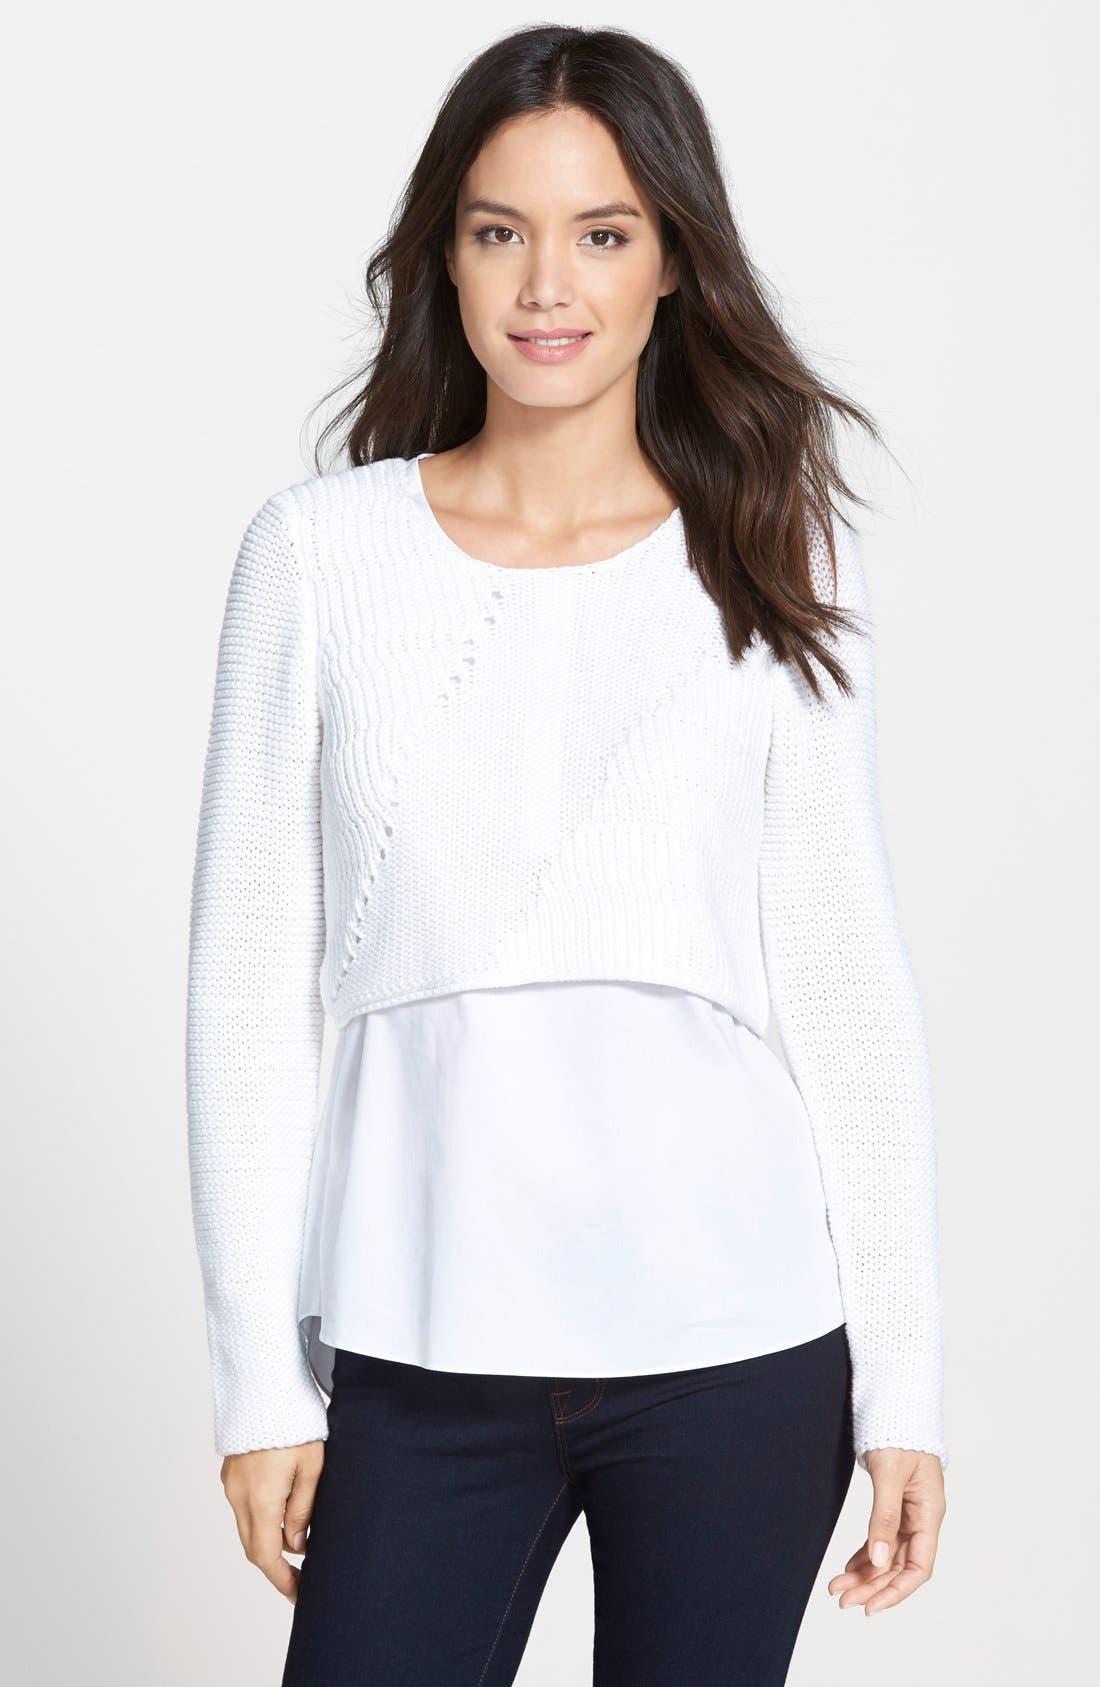 Alternate Image 1 Selected - Elie Tahari 'Elenore' Layered Sweater